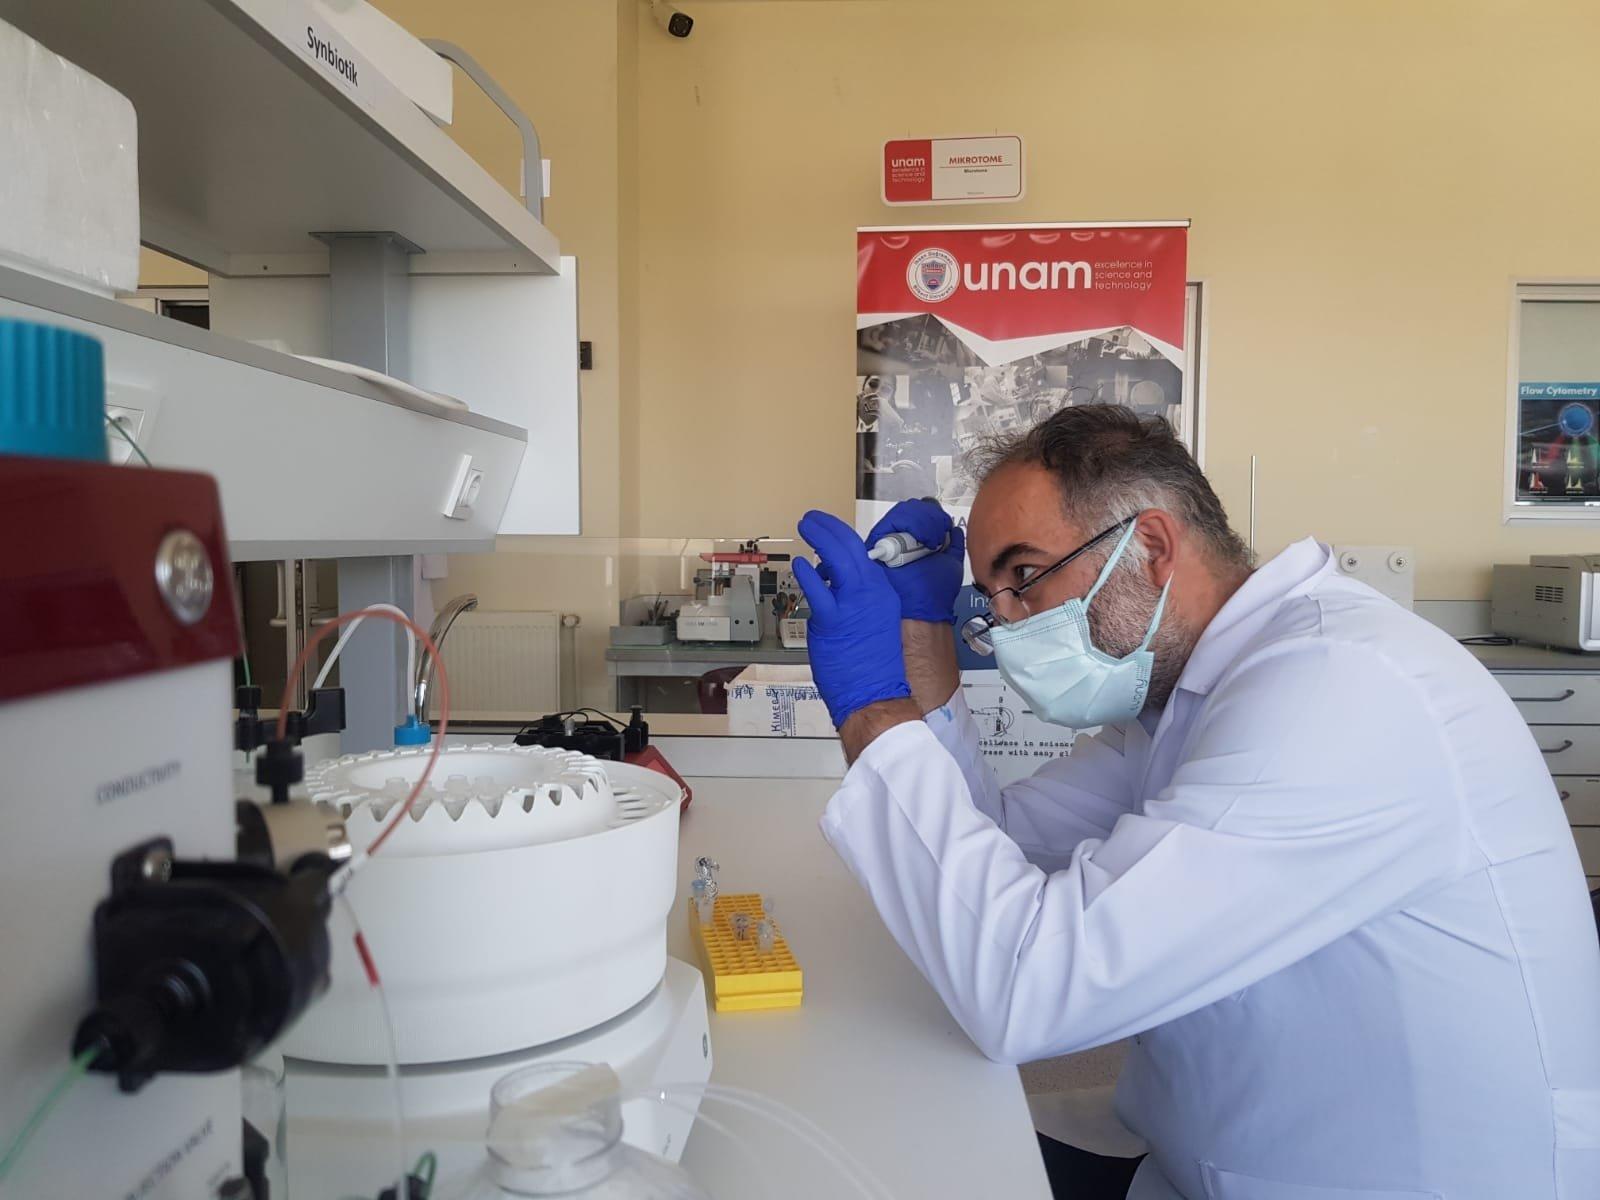 Associate Professor Urartu Şeker works on the drug in a laboratory in the capital Ankara, Turkey, Aug. 25, 2021. (DHA PHOTO)